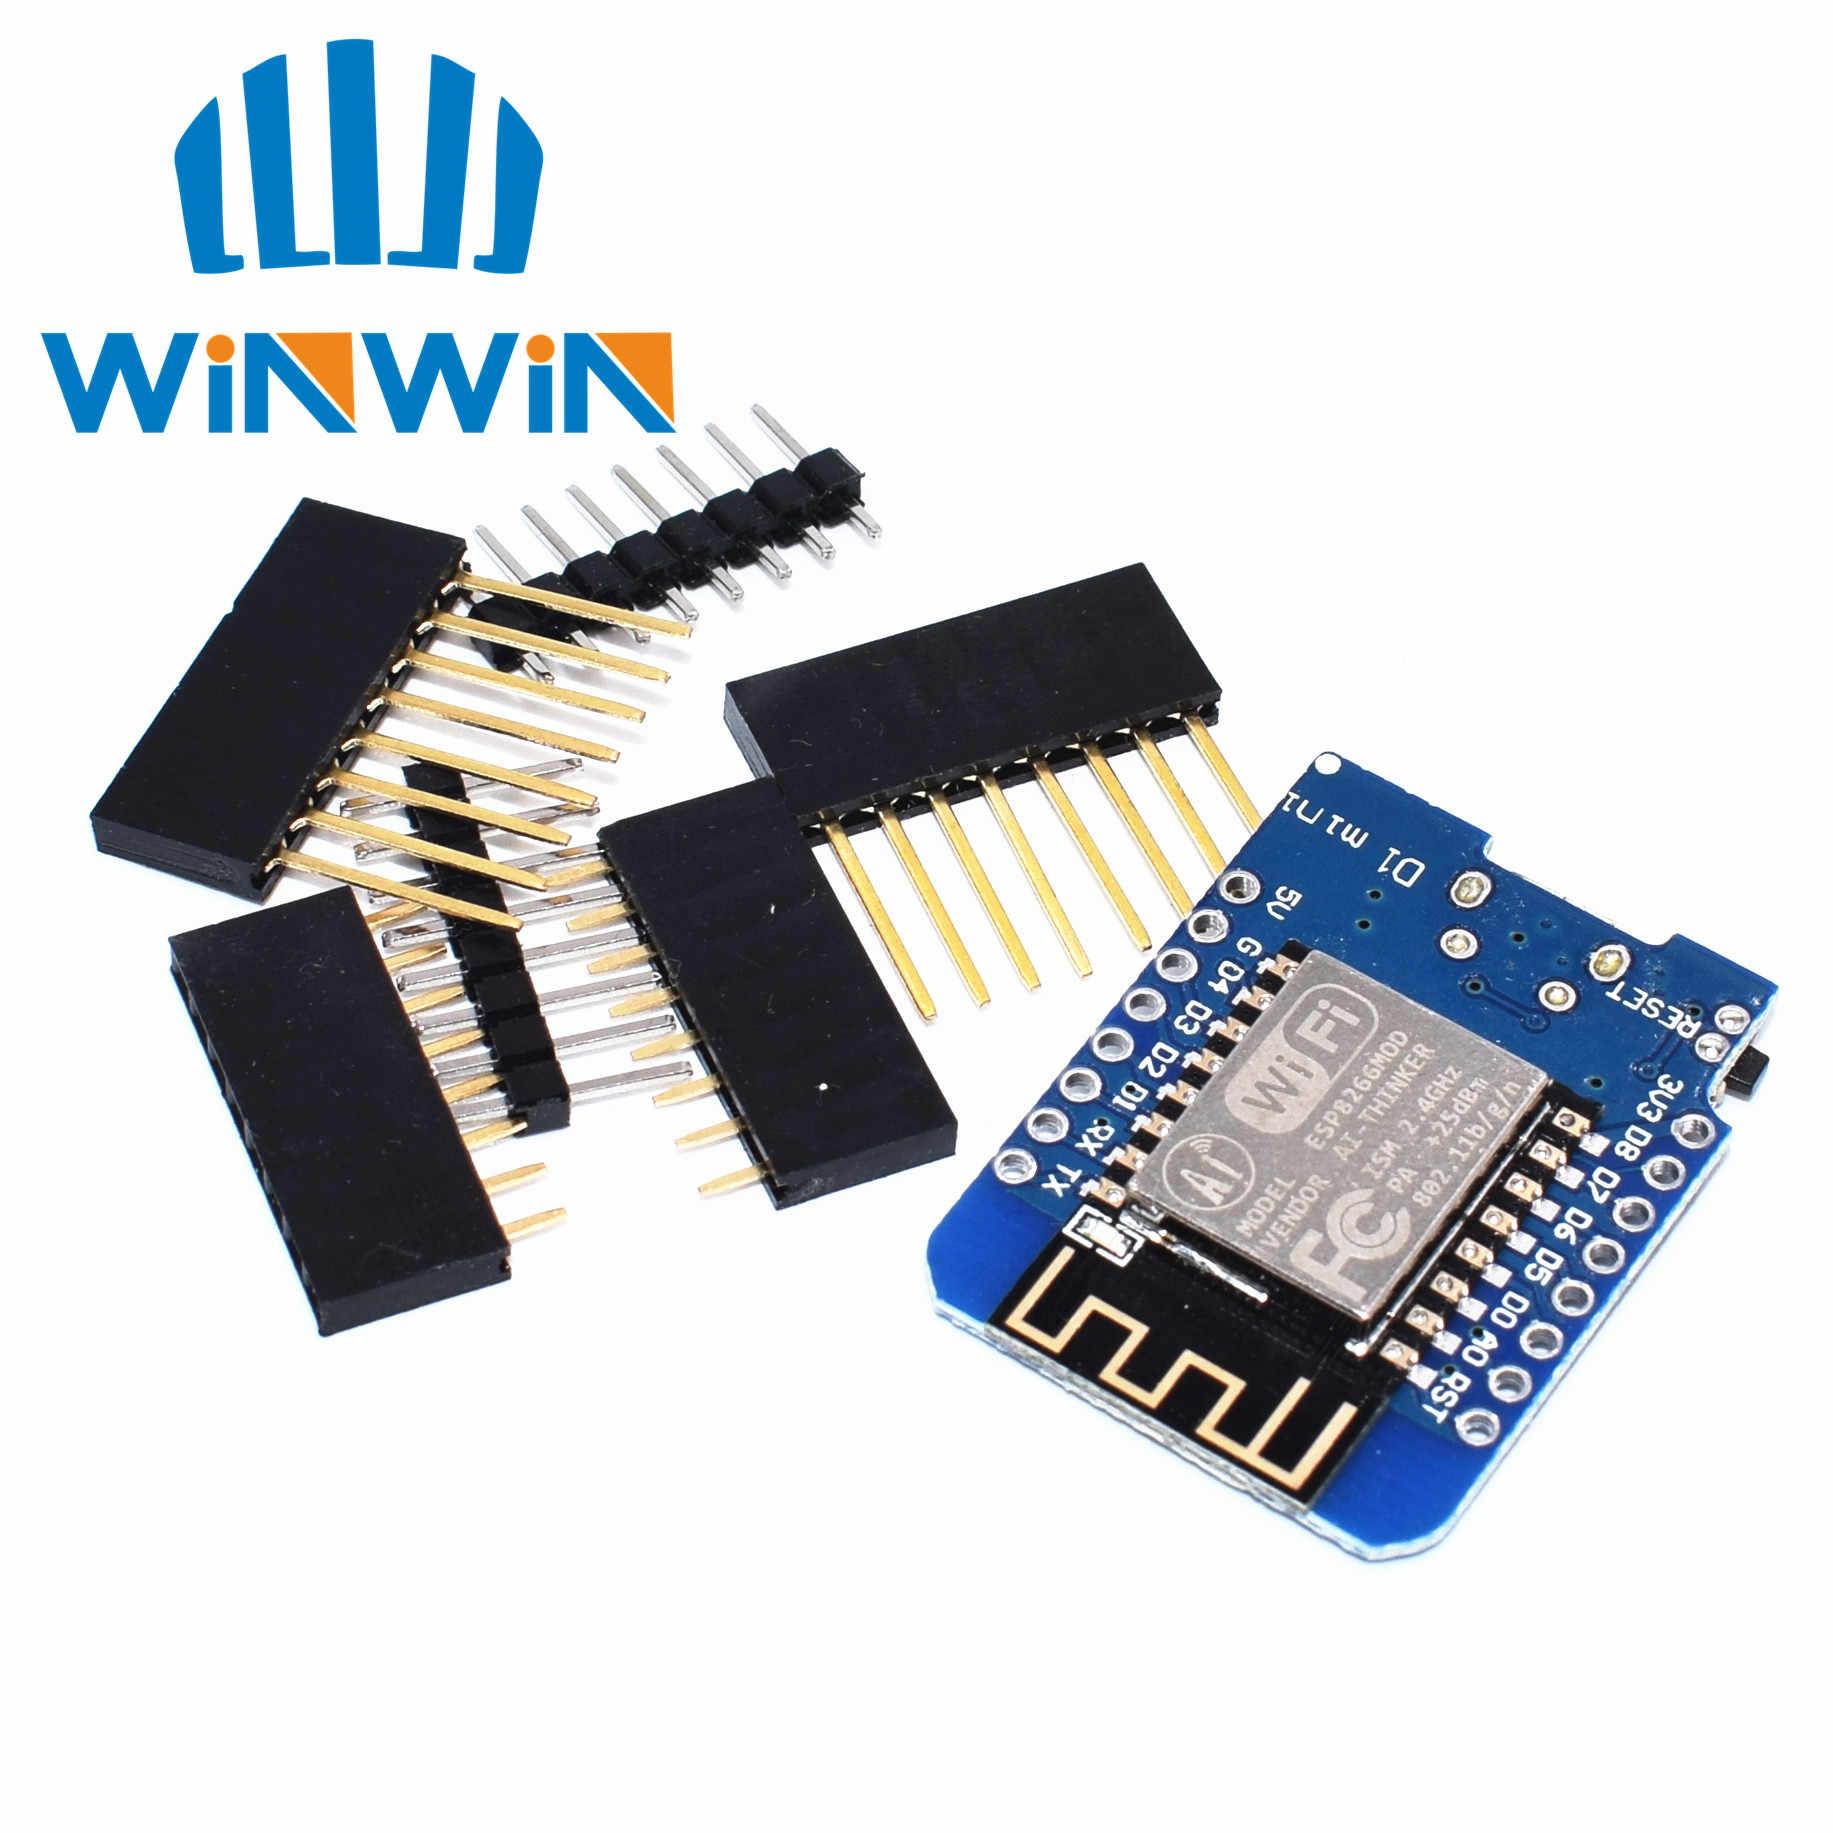 ESP8266 D1 ミニプロ無線 lan 開発ボード nodemcu WS2812 rgb DHT11 DHT22 AM2302 リレー DS18B20 BMP180 用 wemos diy キット